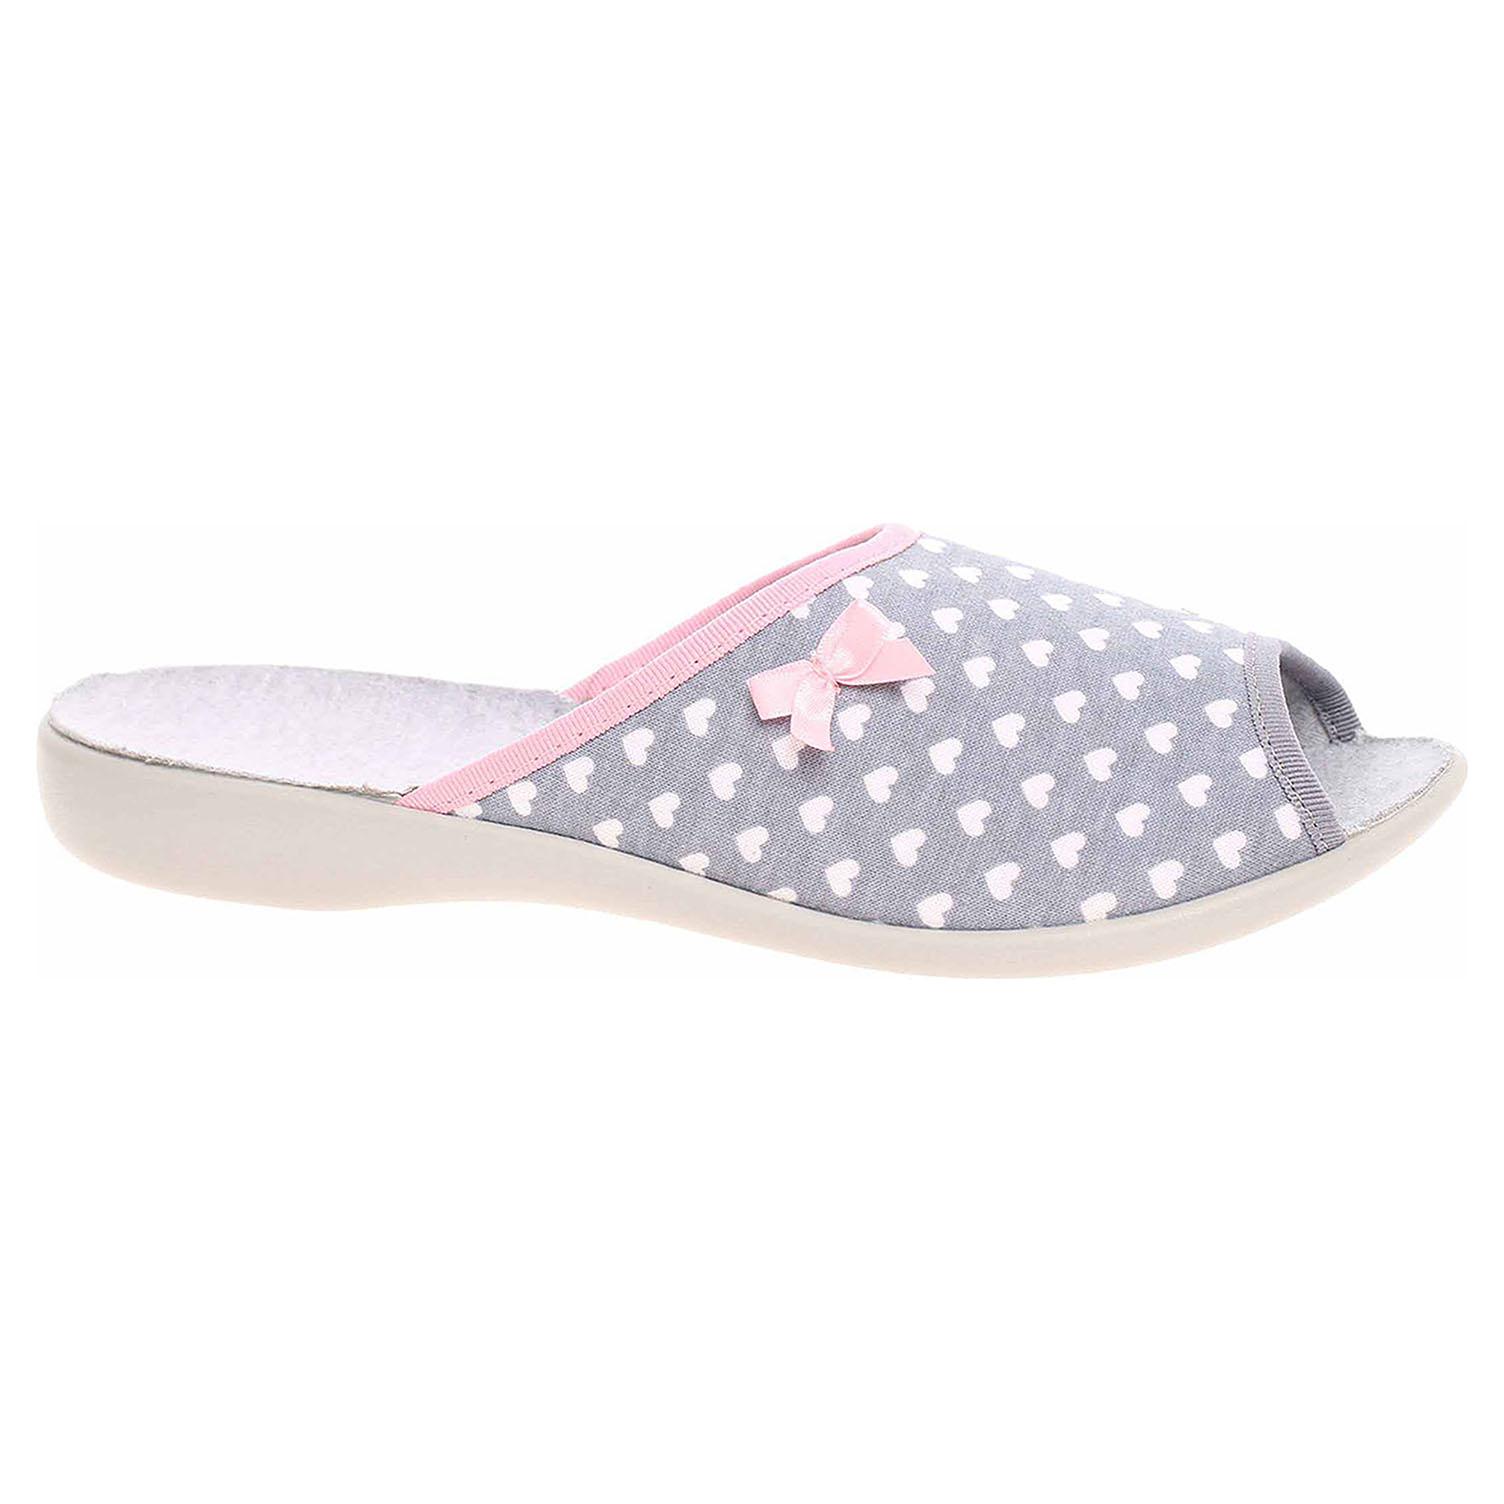 Dámské domácí pantofle Befado 254D064 šedá 254D064 38